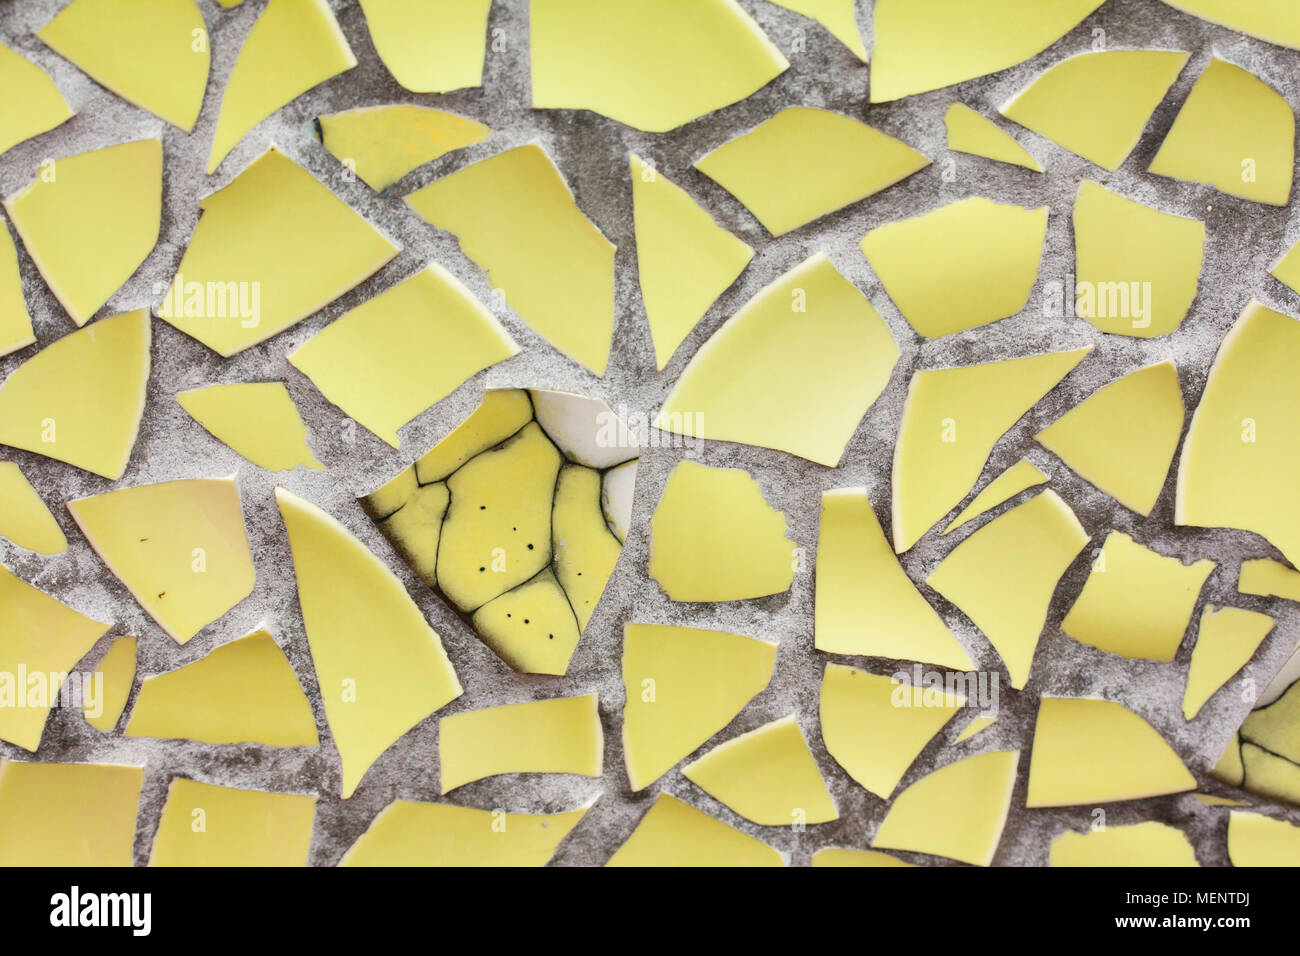 Wonderful Broken Glass Wall Art Pictures Inspiration - The Wall Art ...